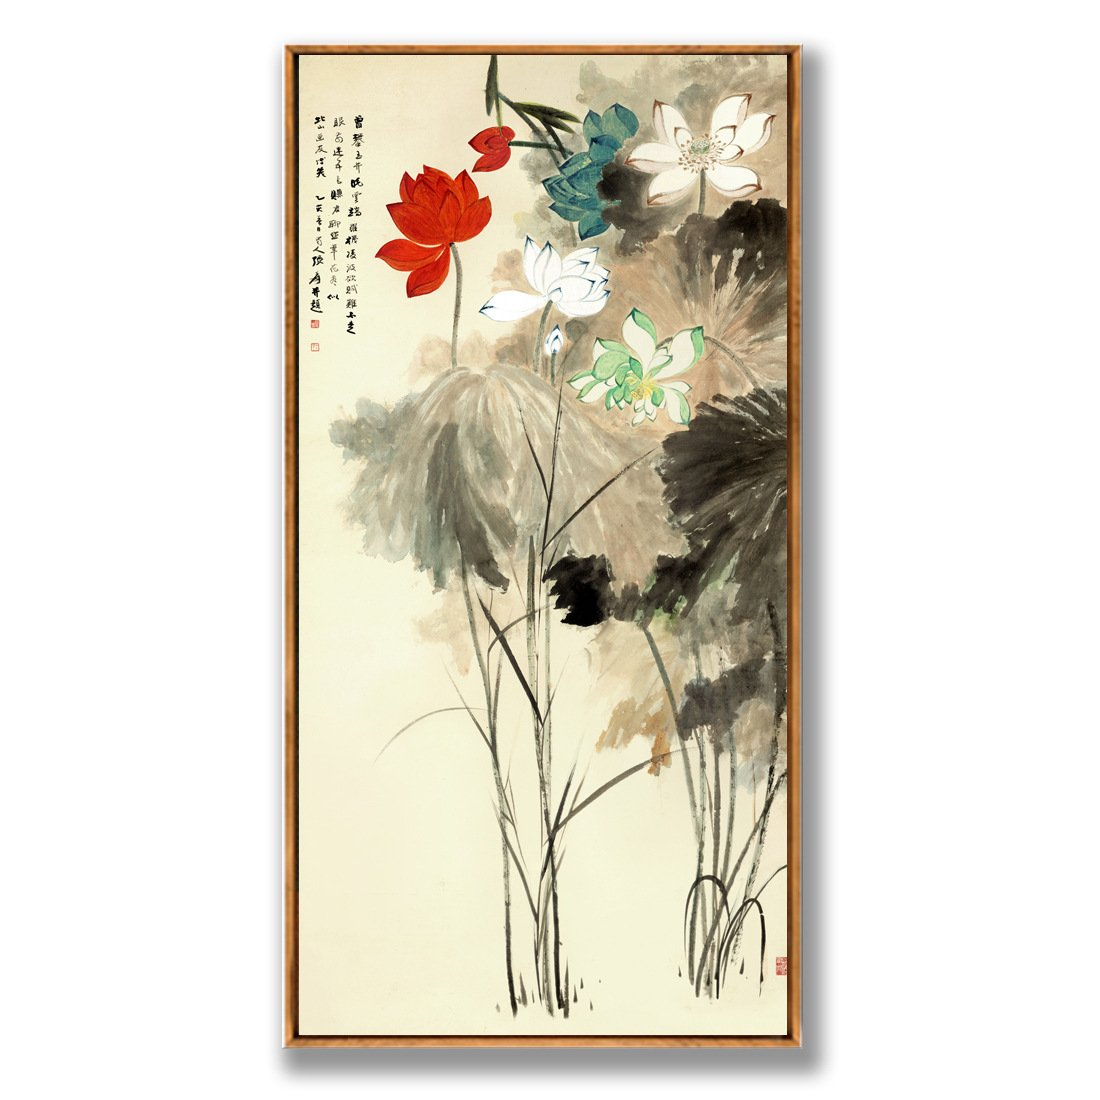 Sykdybz 現代的な中国絵画蓮の 3 つのオンライン店舗への書き込みや、 C の当ホテルは、 40 X 80 Cm で装飾されている。 B07D5VVS31 C C